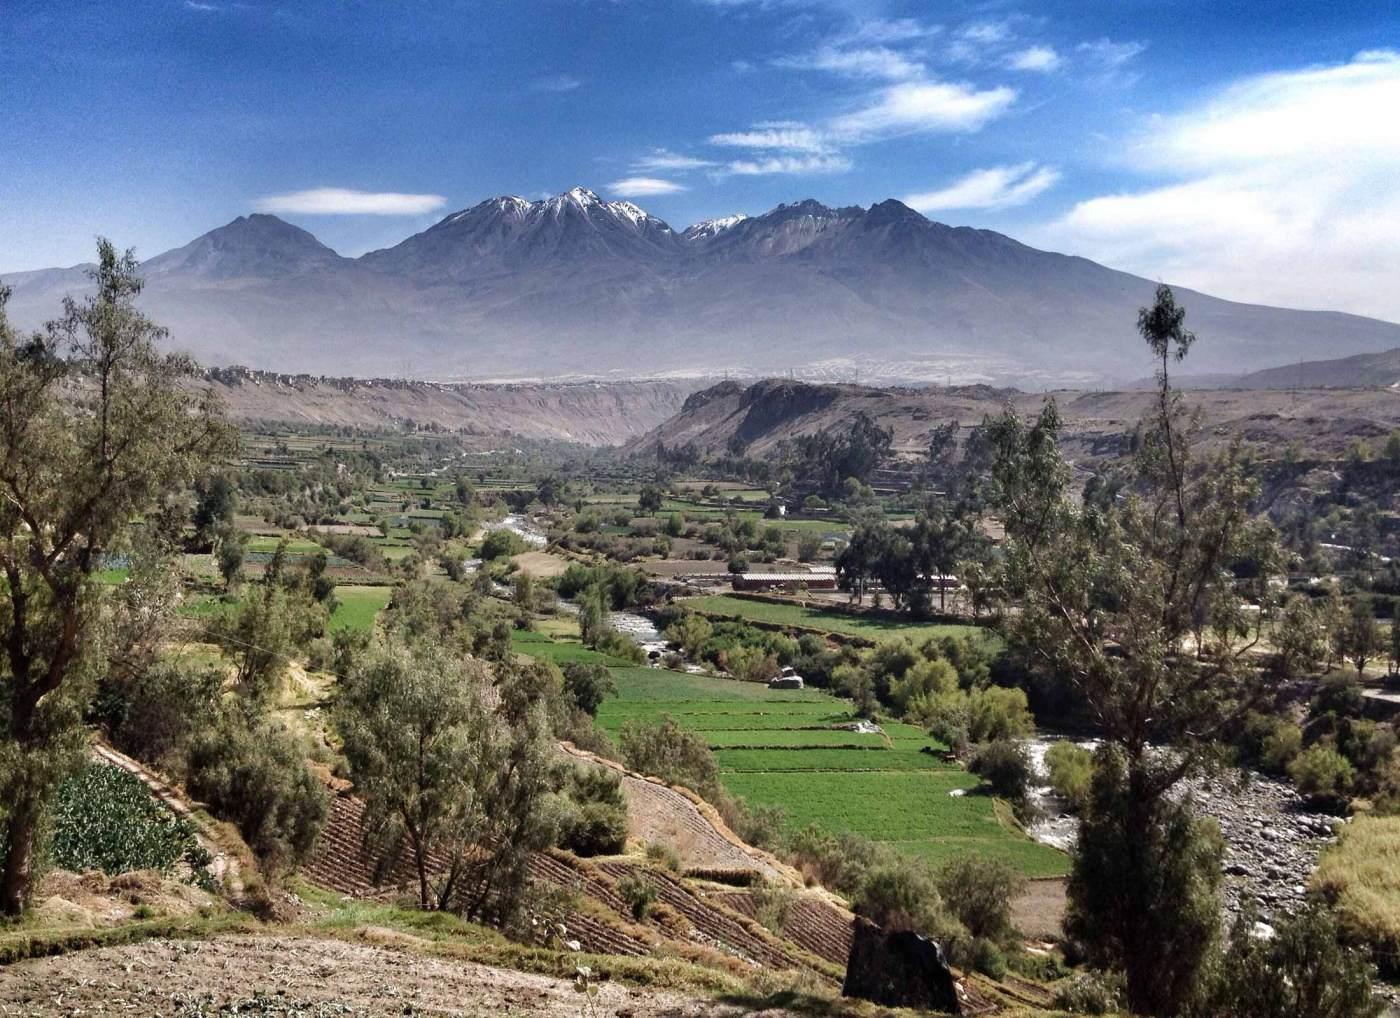 mirador-de-carmen-alto - Andean Peru Treks